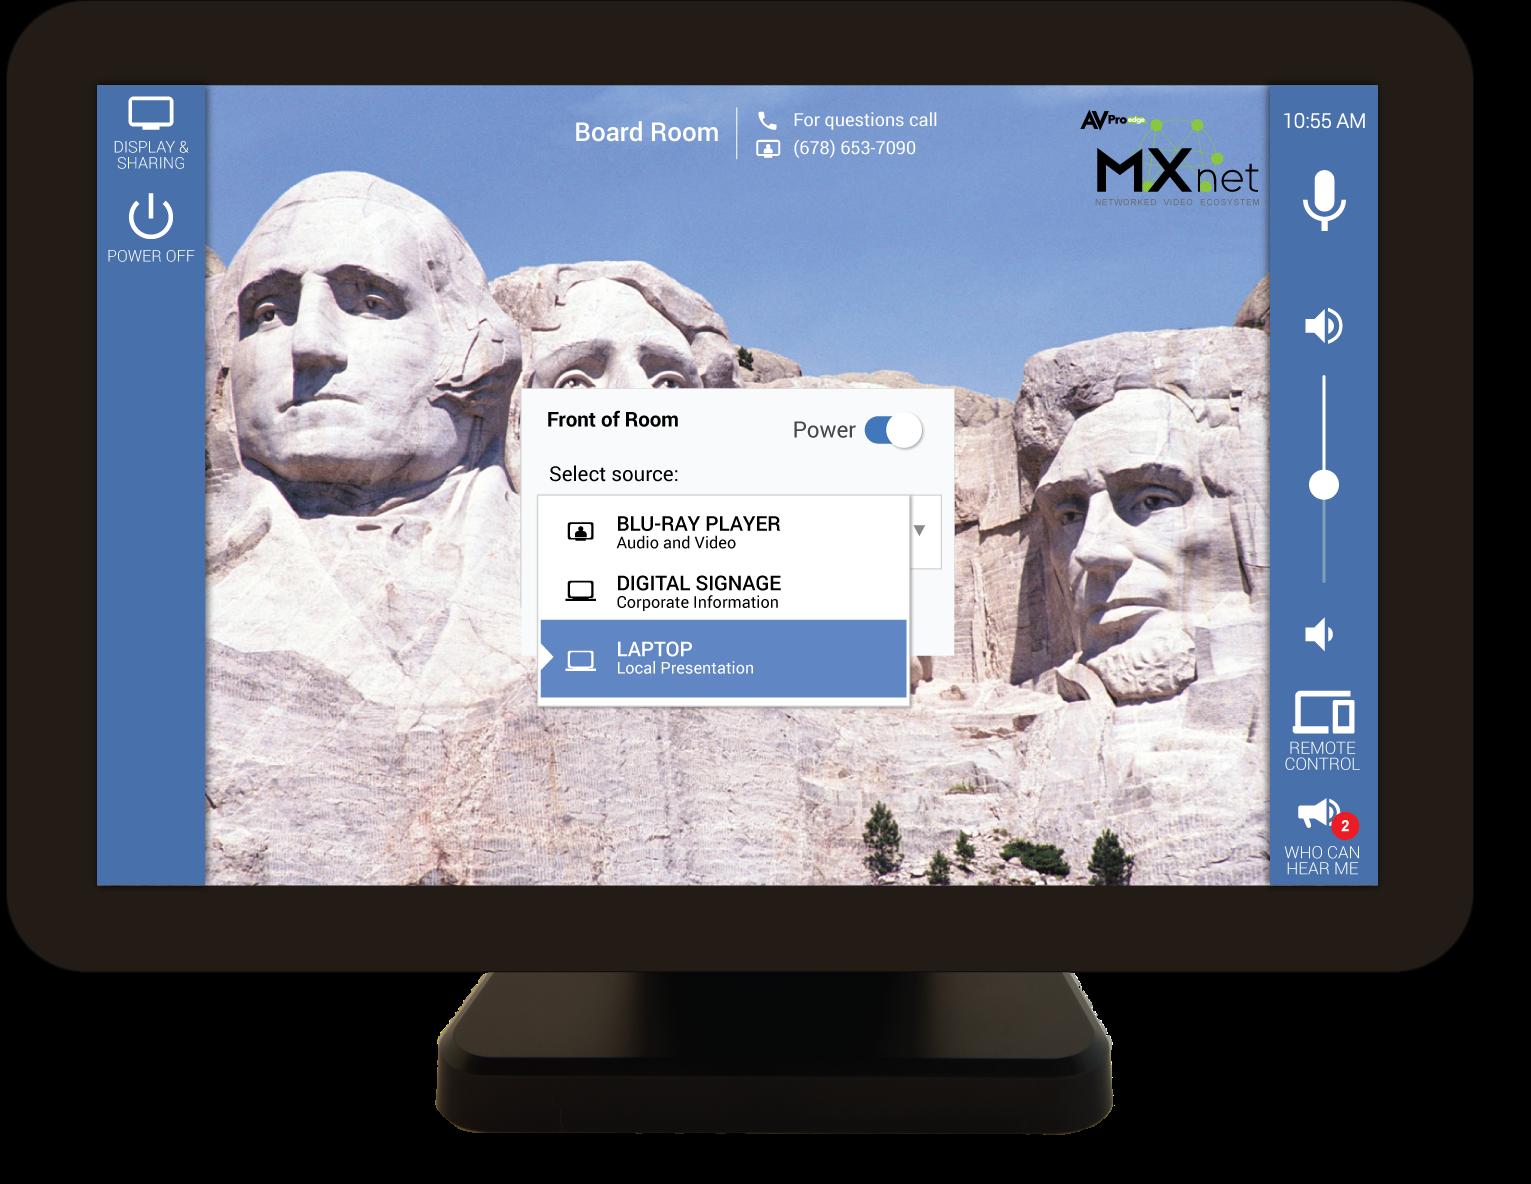 control AVPro Edge MXNet AV-over-IP systems with Mira Connect